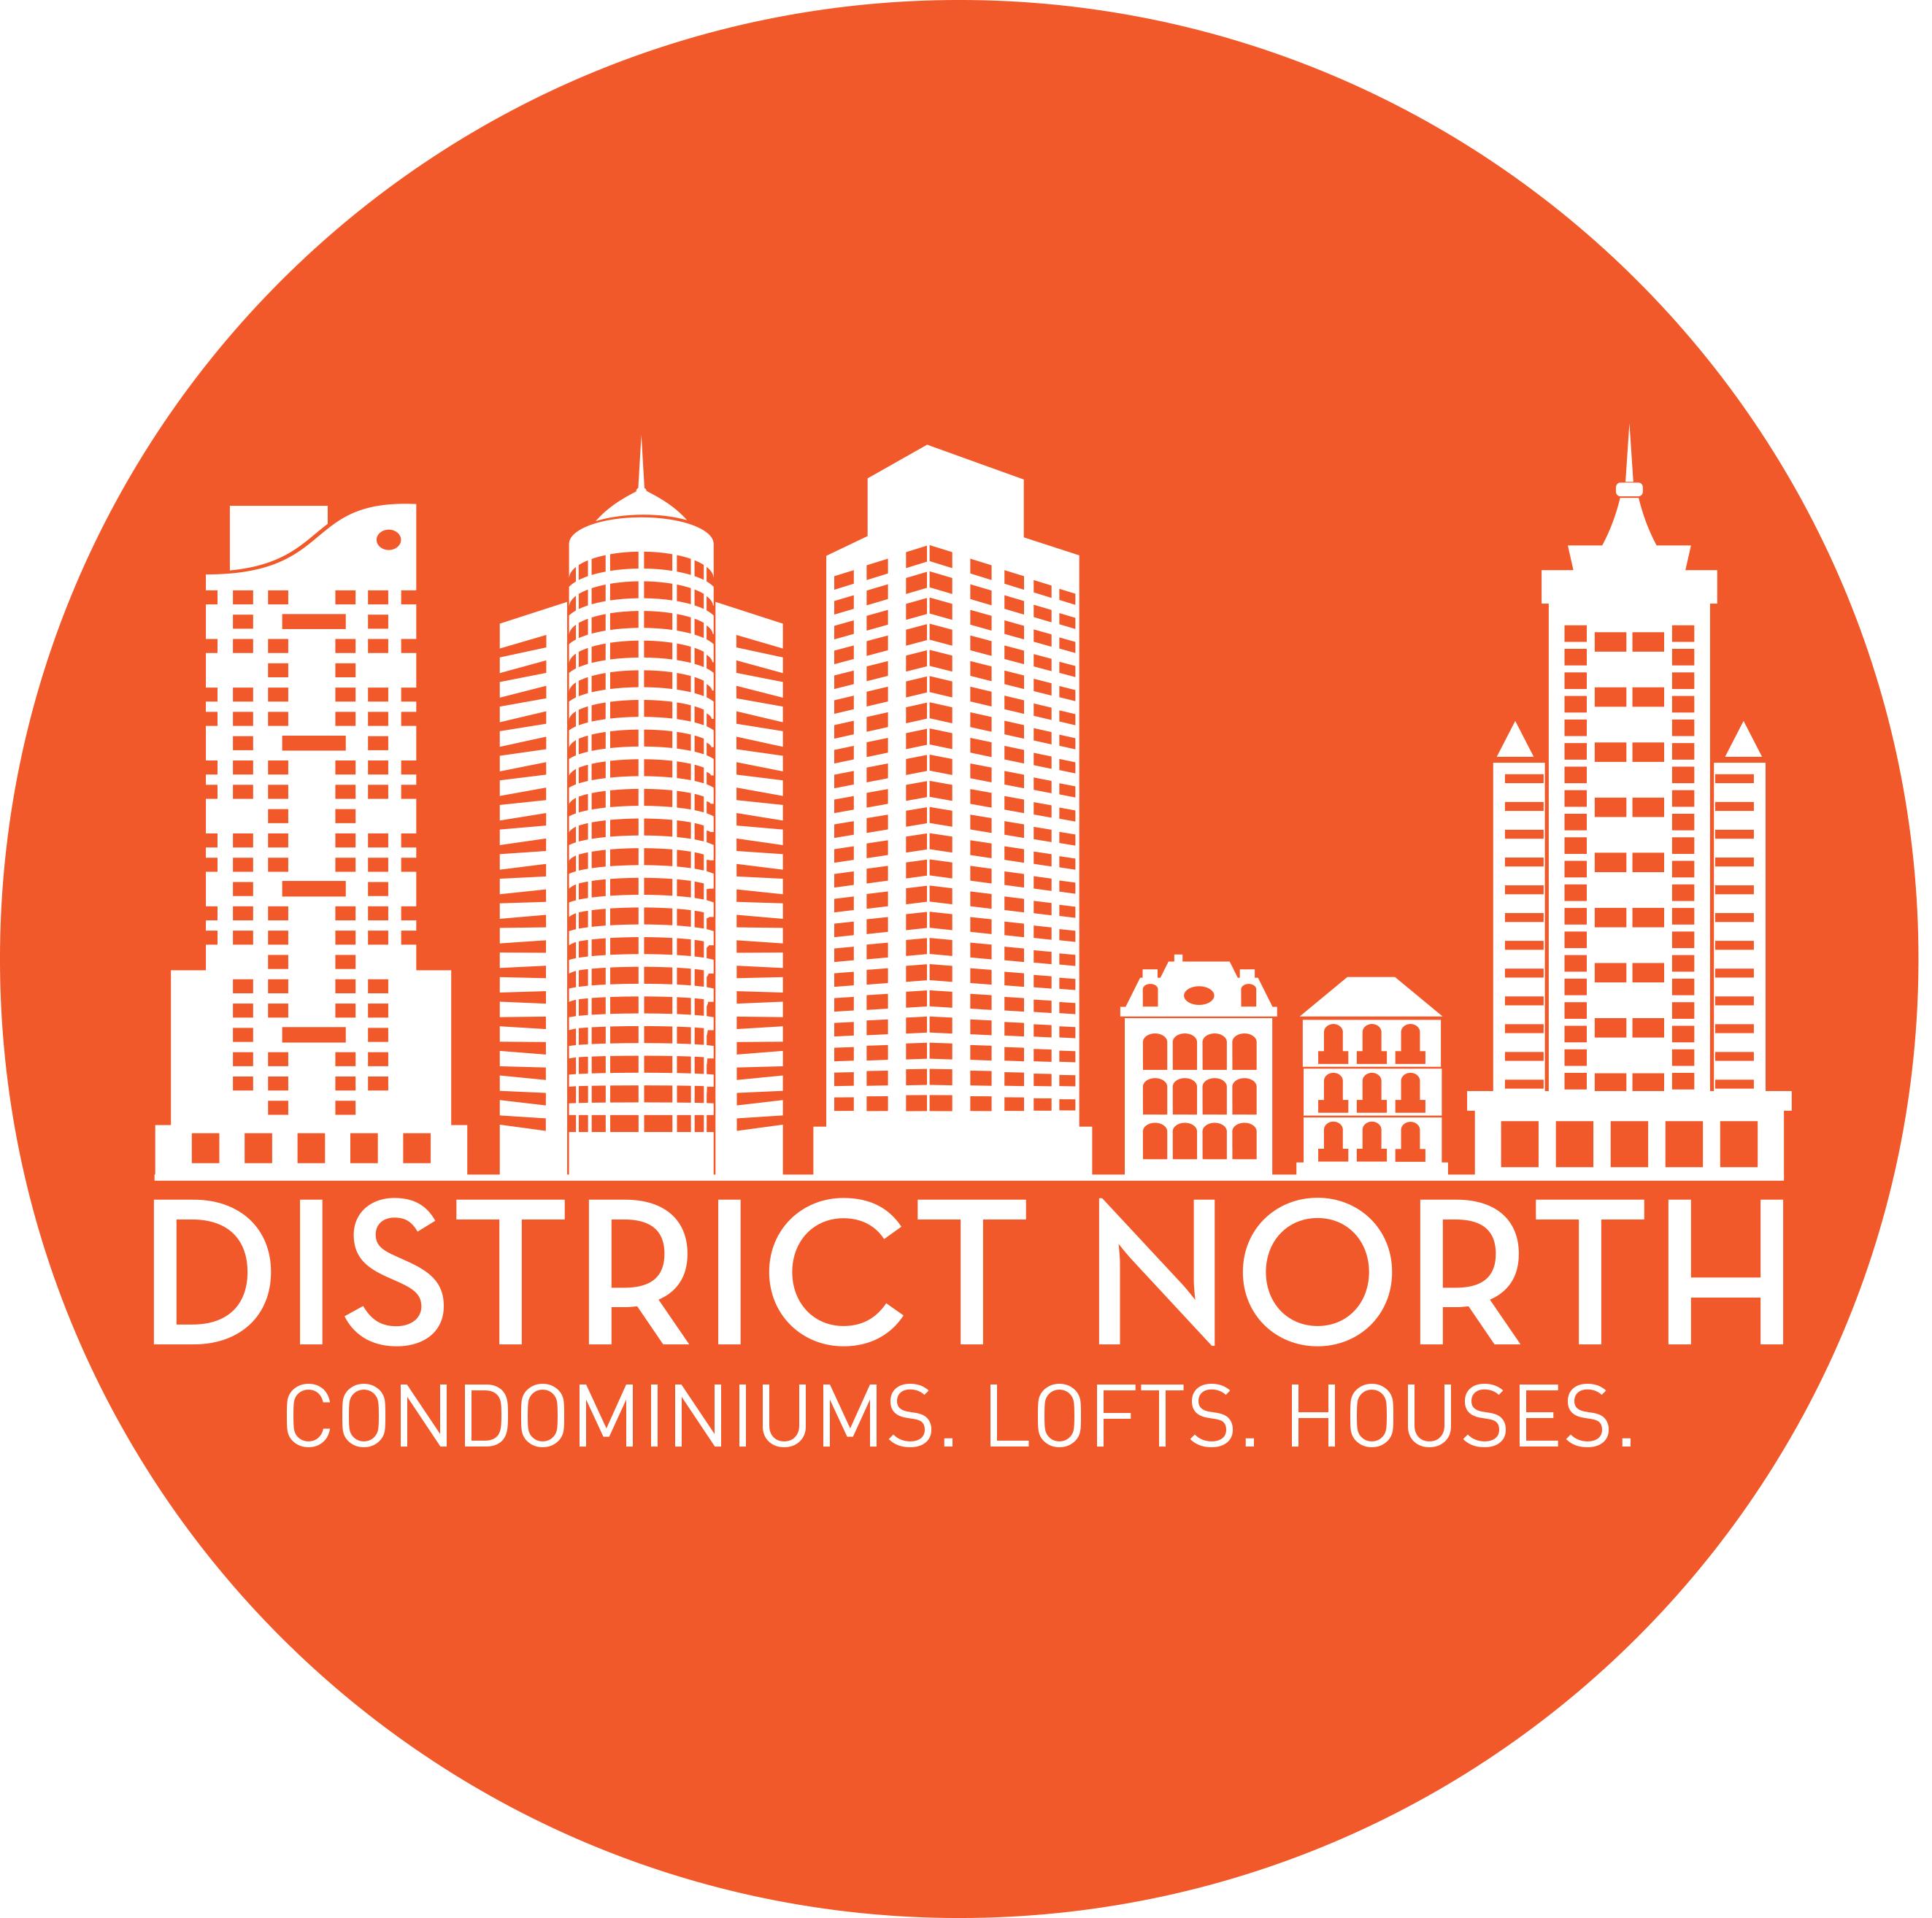 District_North_2_big.jpg